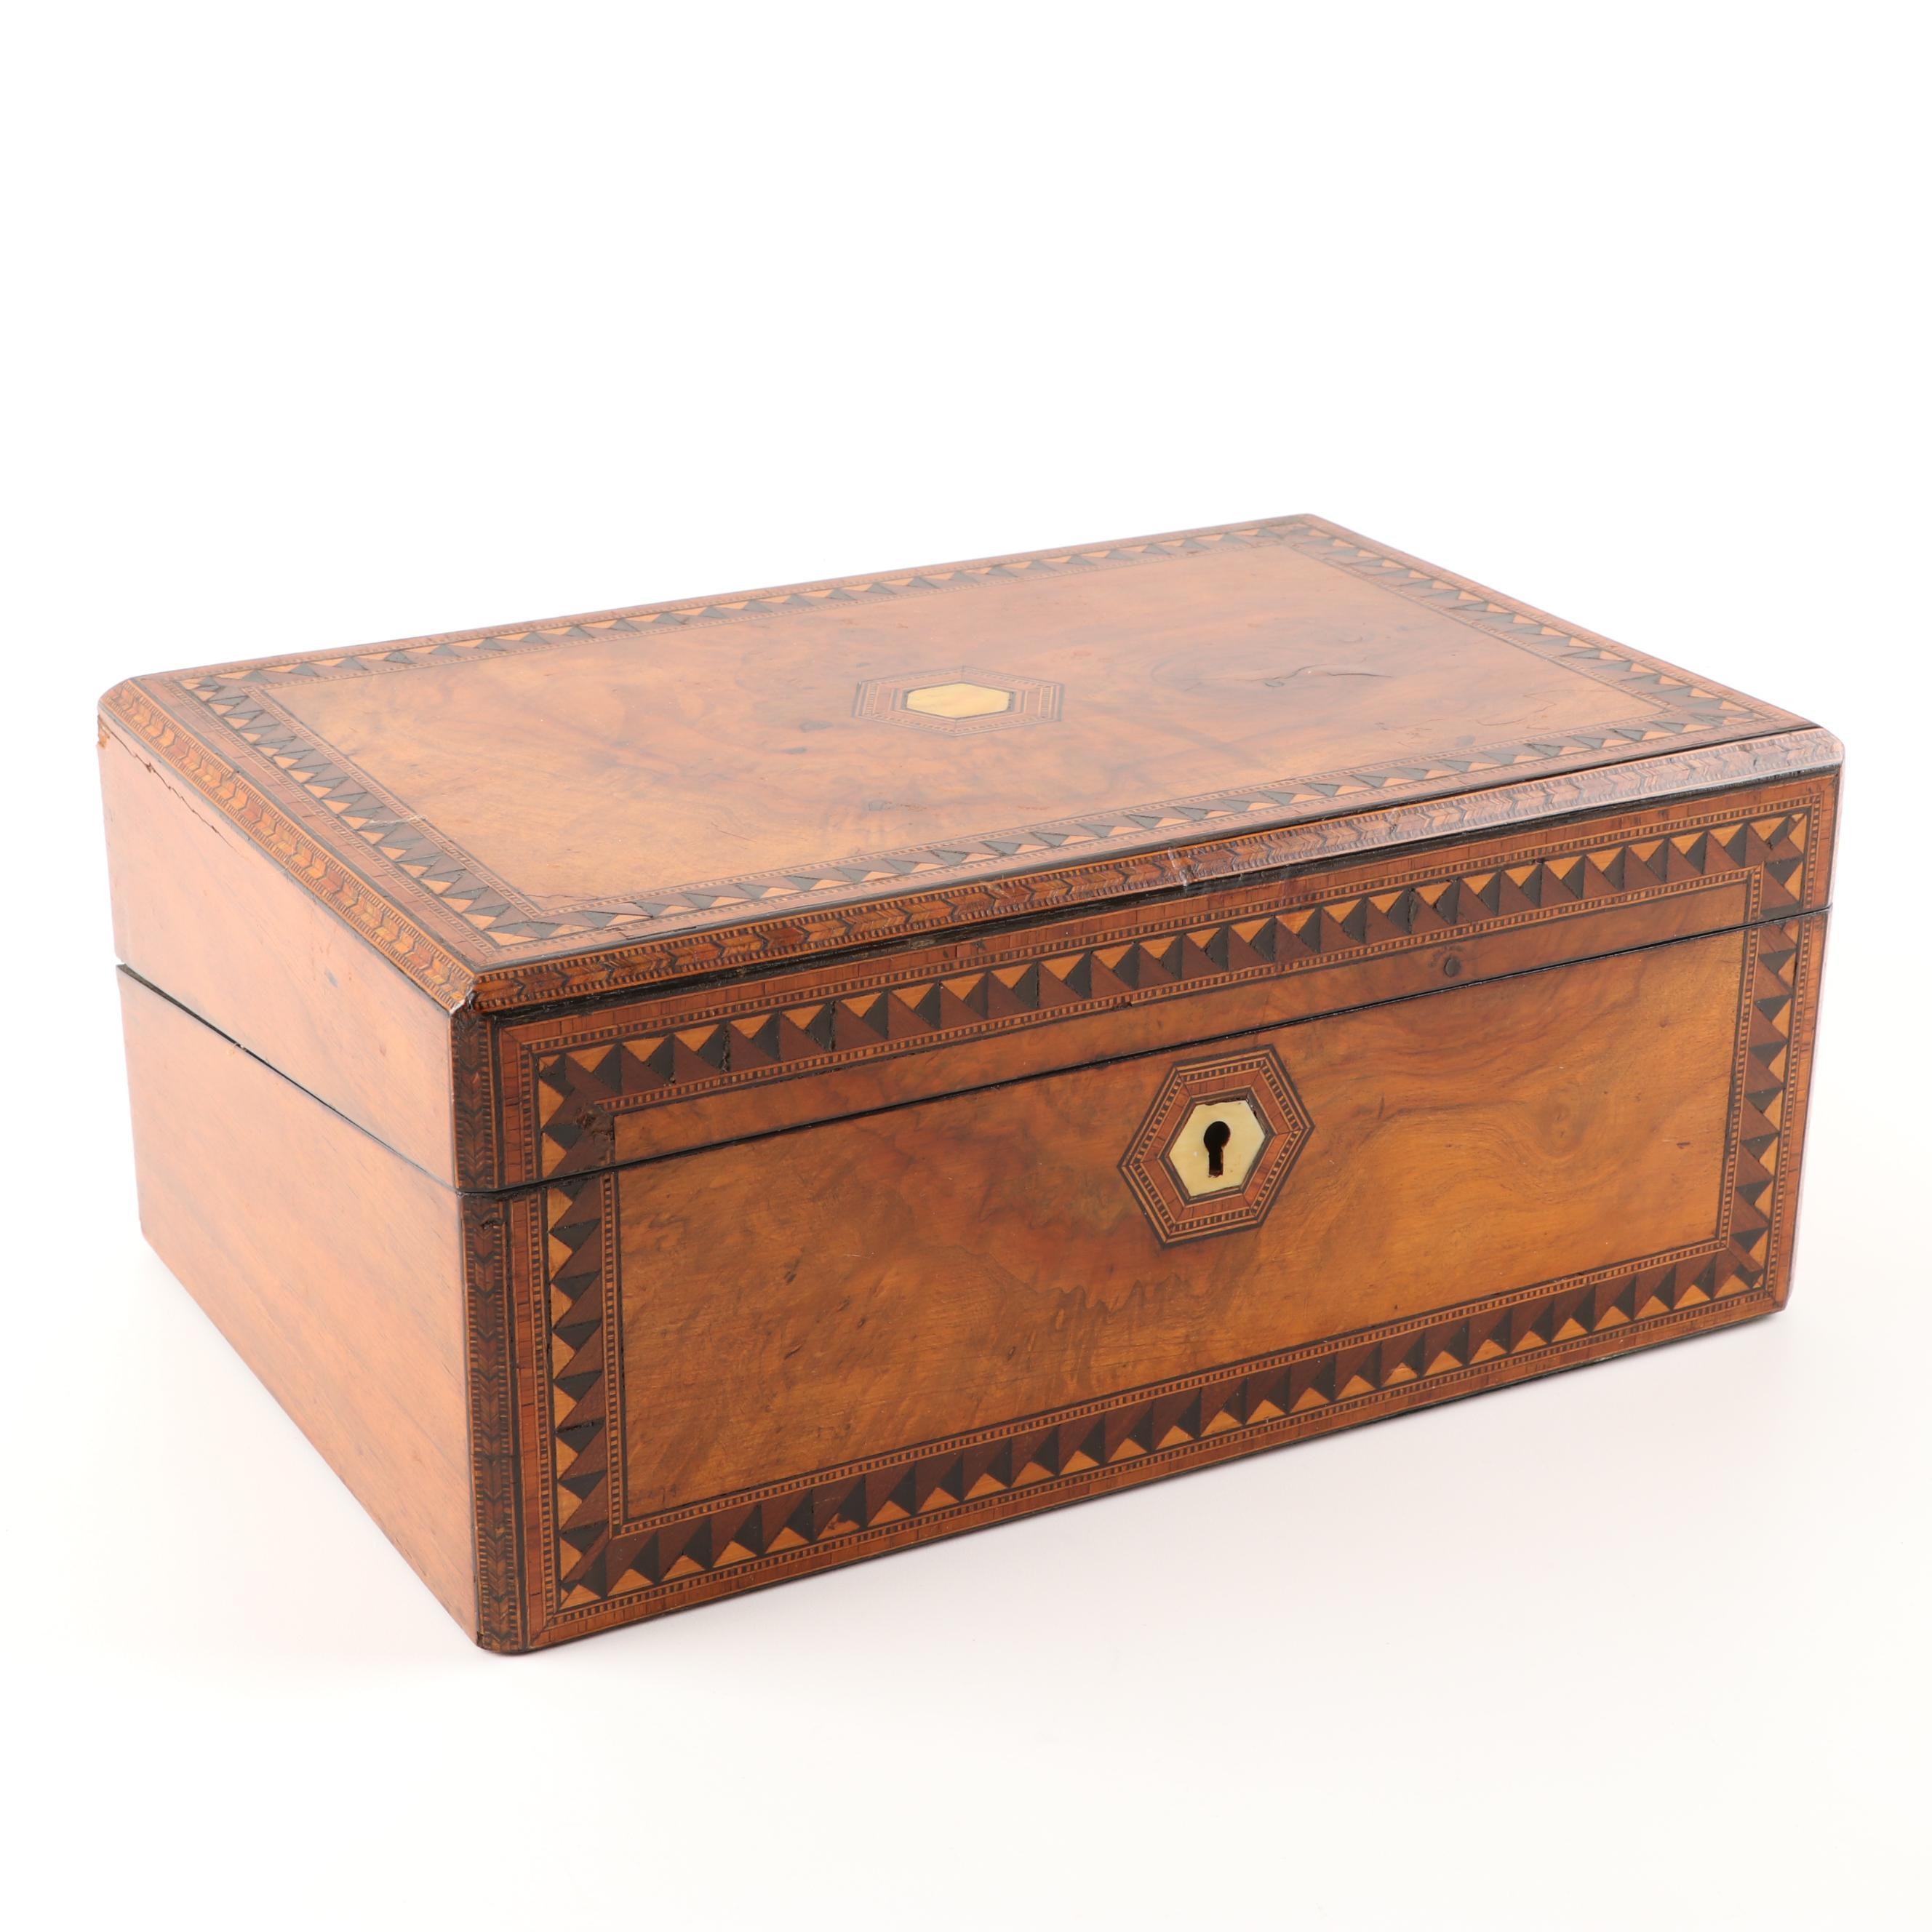 Burl Walnut Parquetry Inlay Document Box